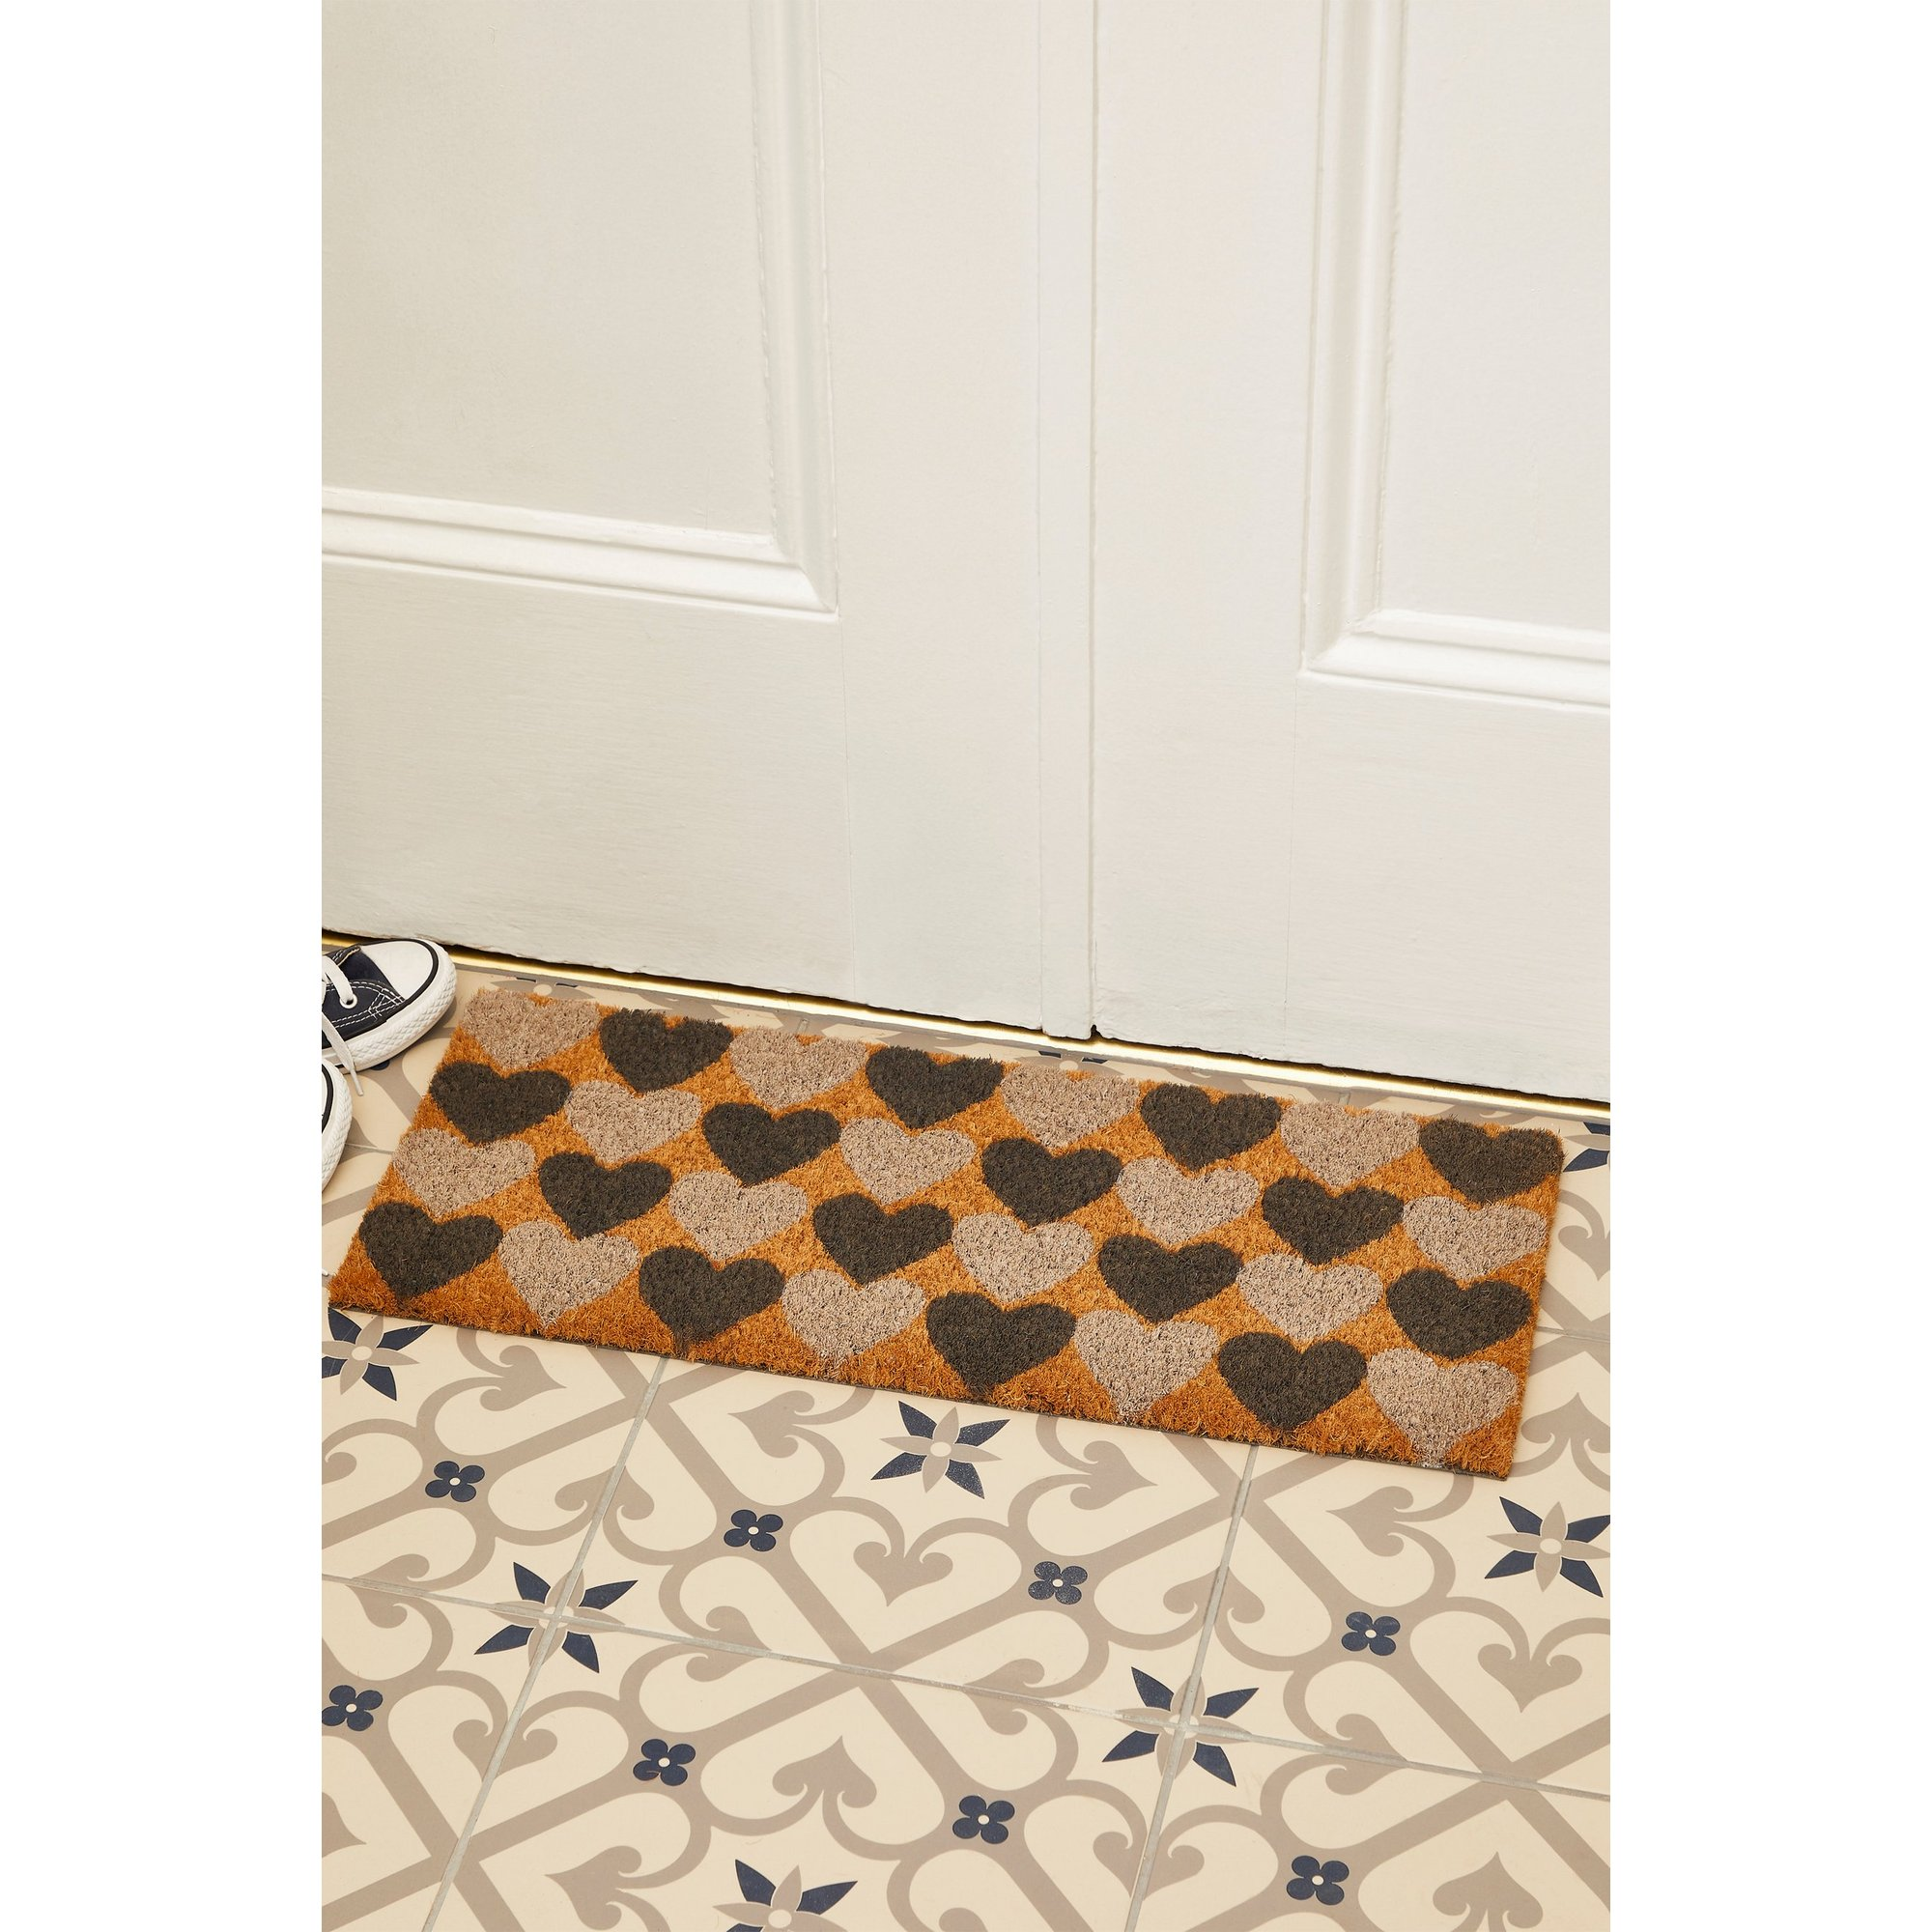 Image of Astley Charcoal Hearts Printed Step Mat